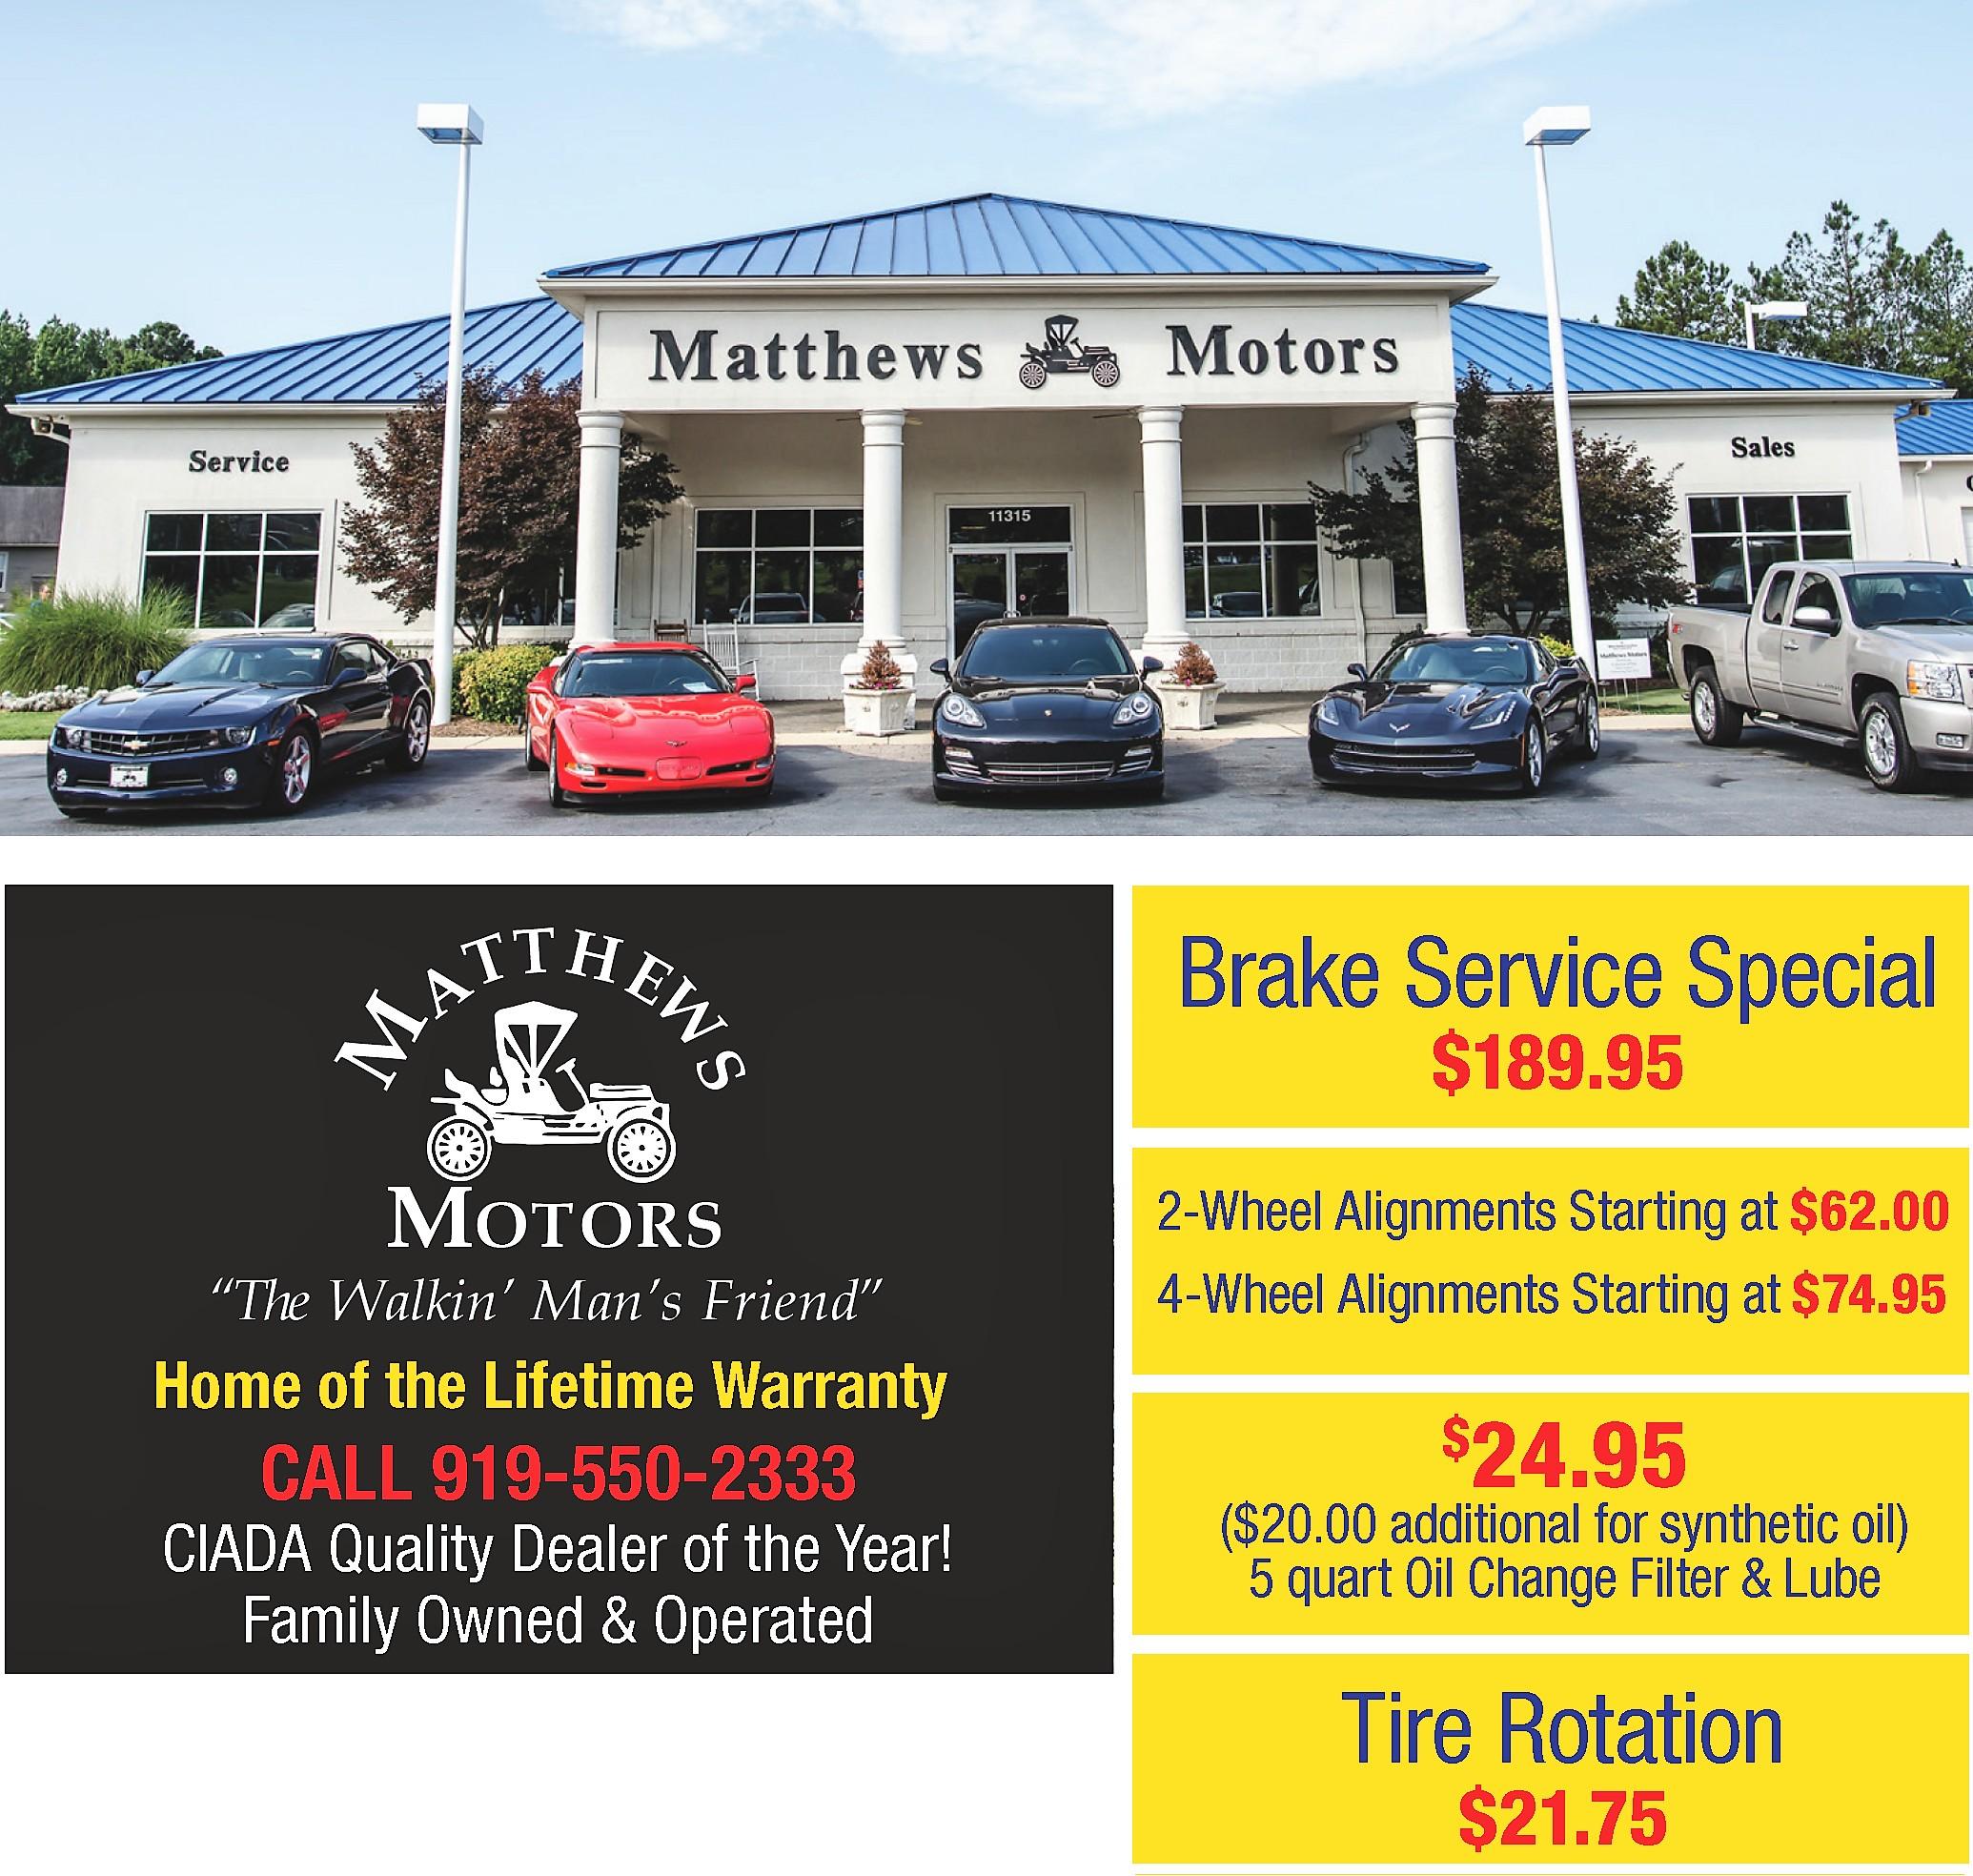 Matthew Motors Goldsboro Nc >> Matthews Motors Linkedin